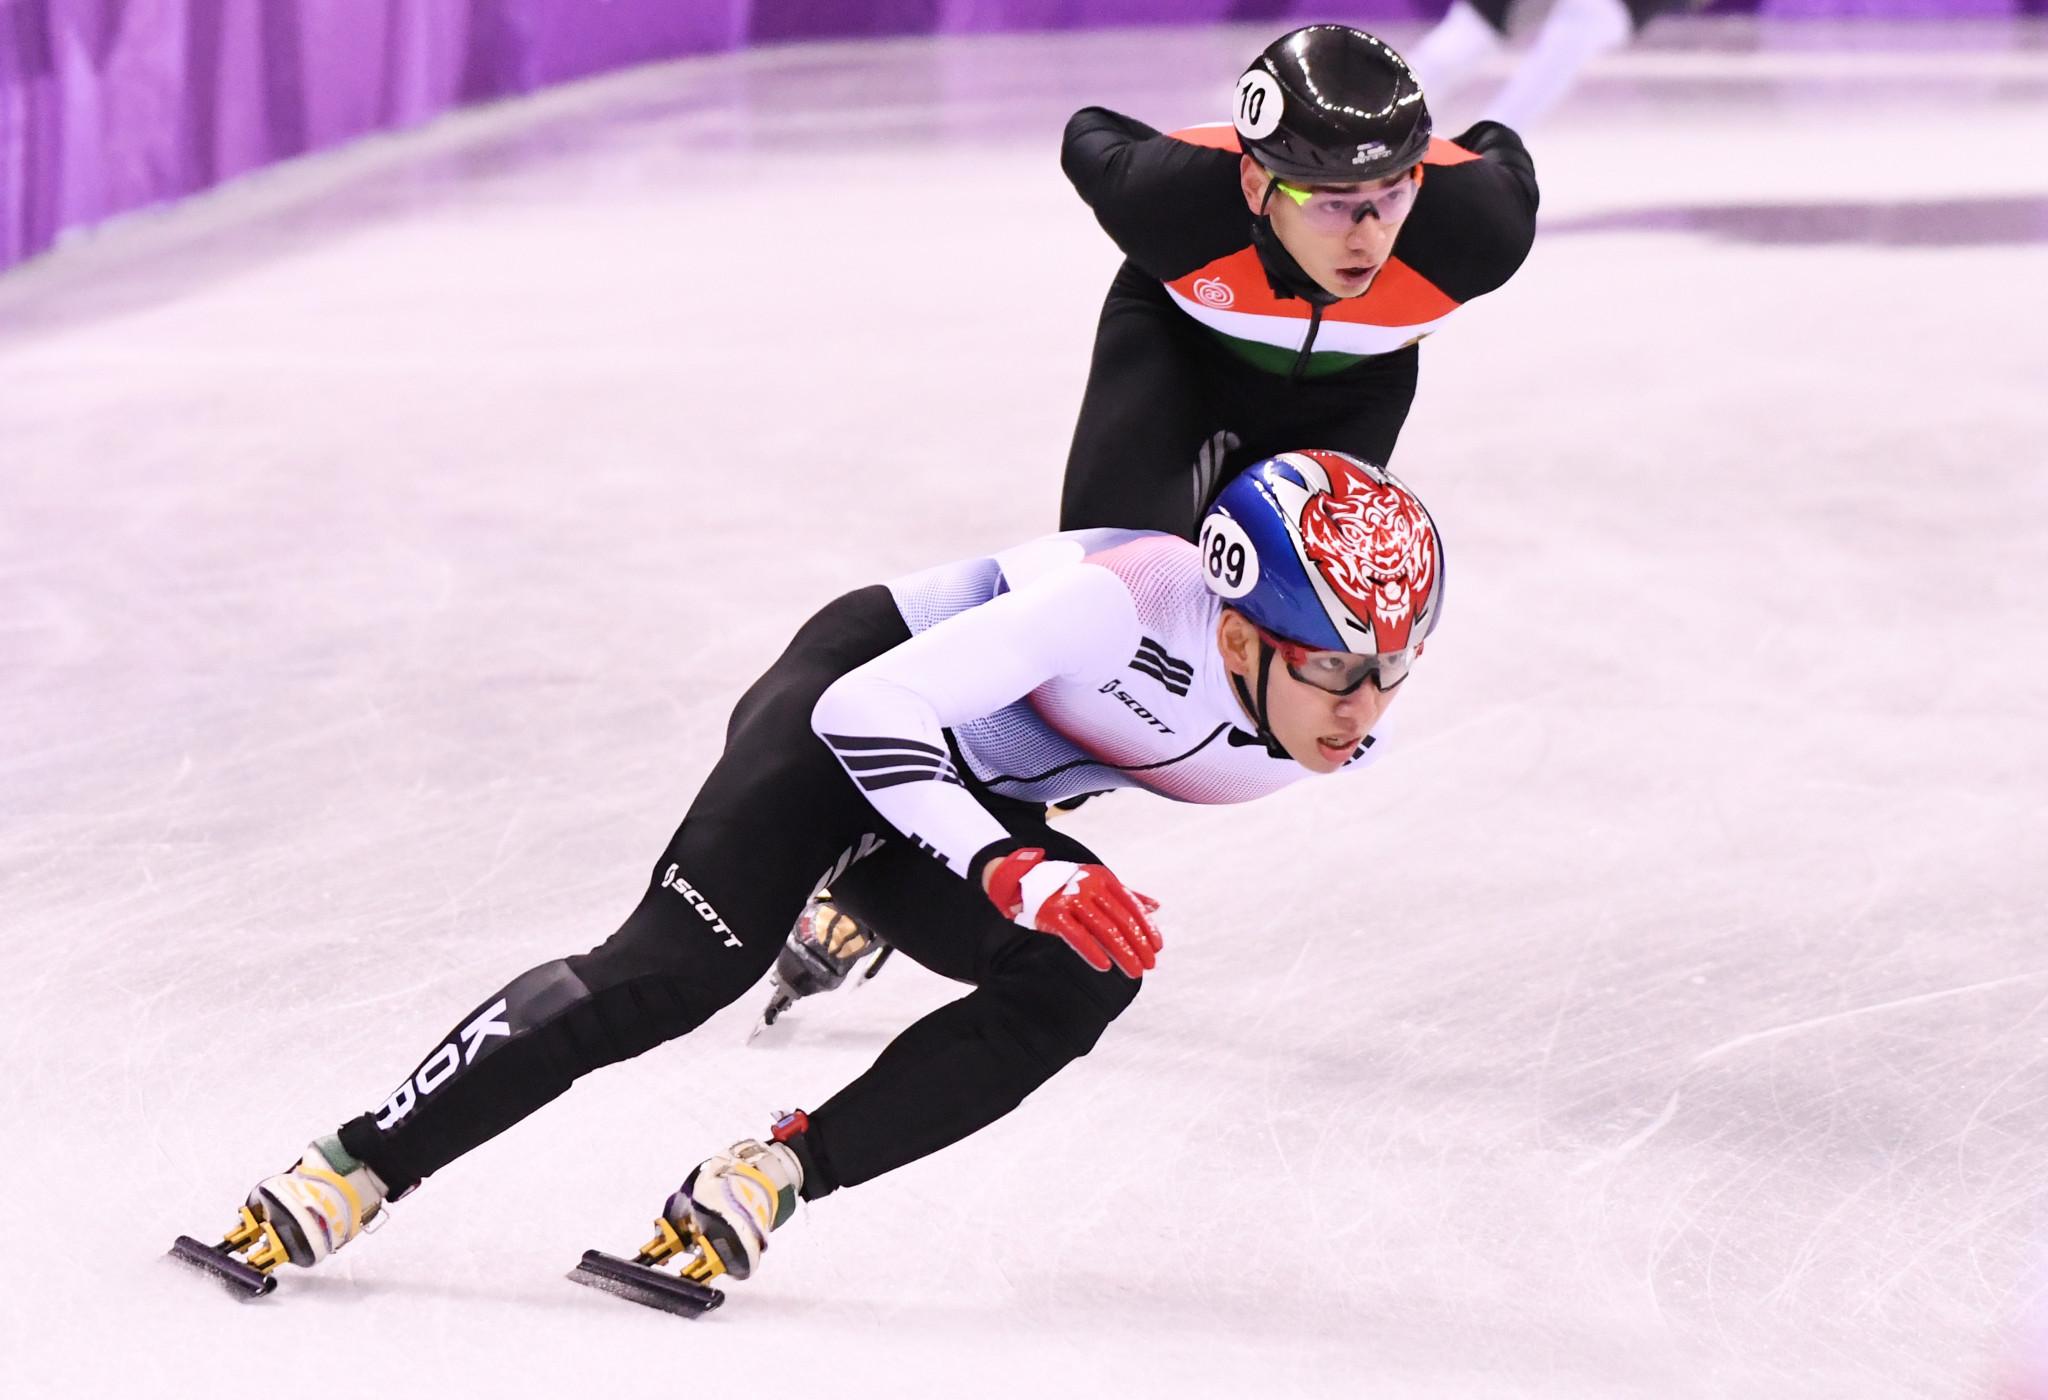 South Korea's Lim Hyo Jun won the men's 500m ©Getty Images